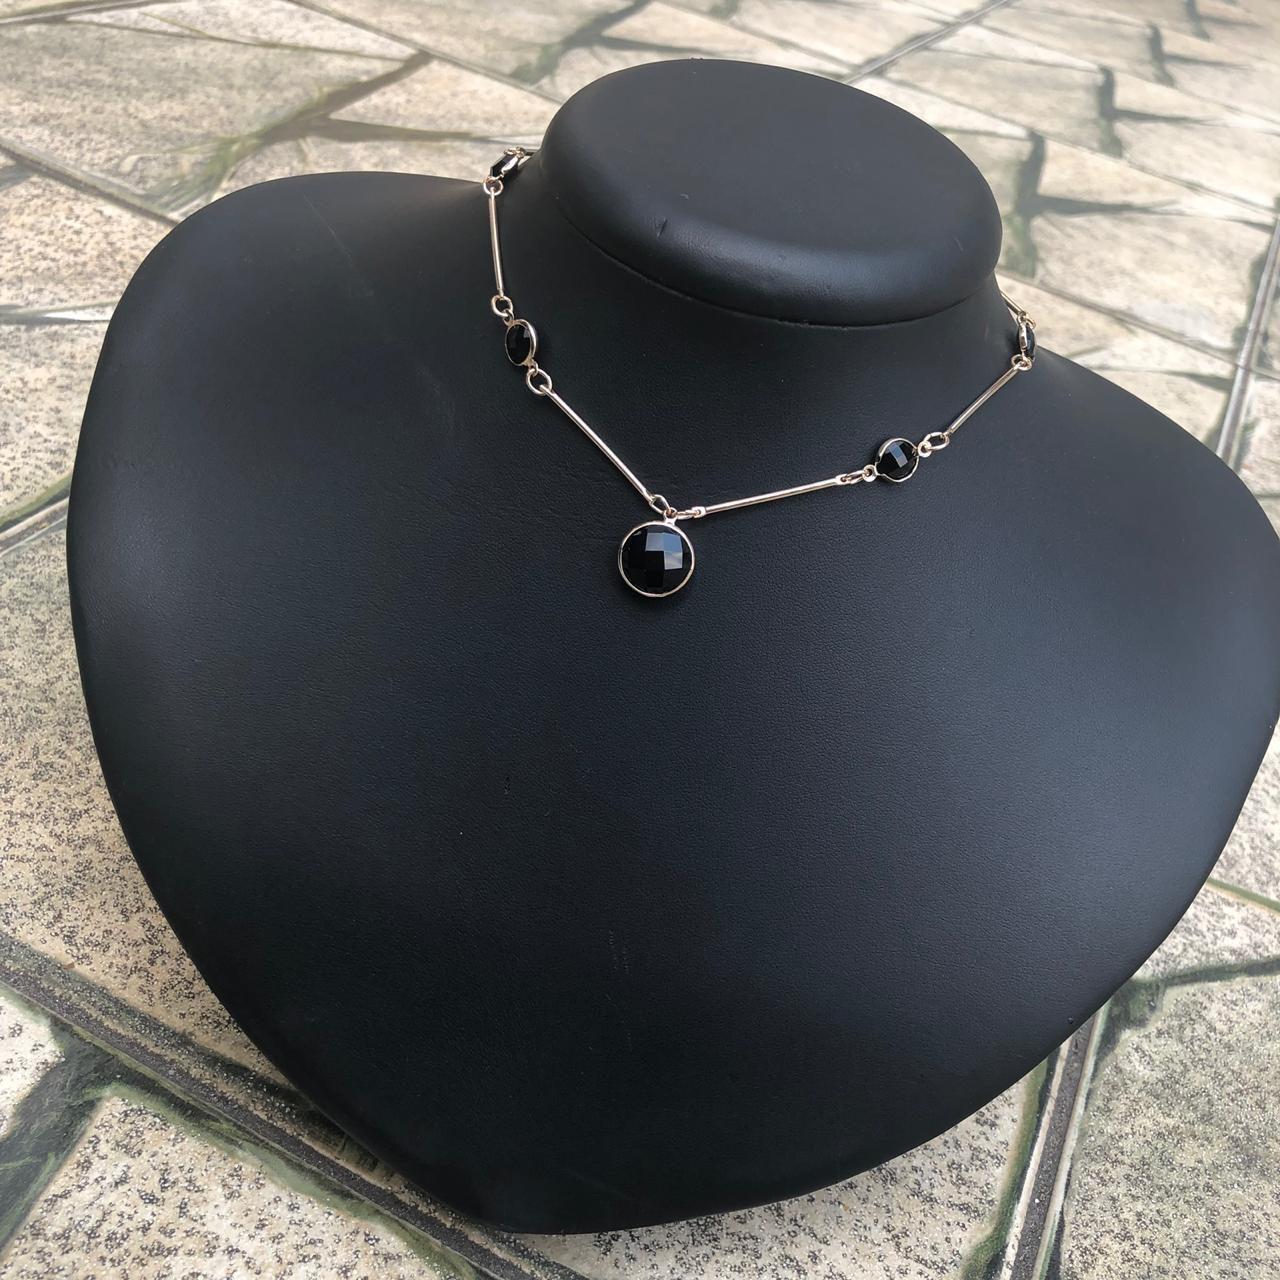 0166a05bd98 1bbc2a+pulseira+folheada+dourada+esferas+estilhacadas+corujinha+ ...